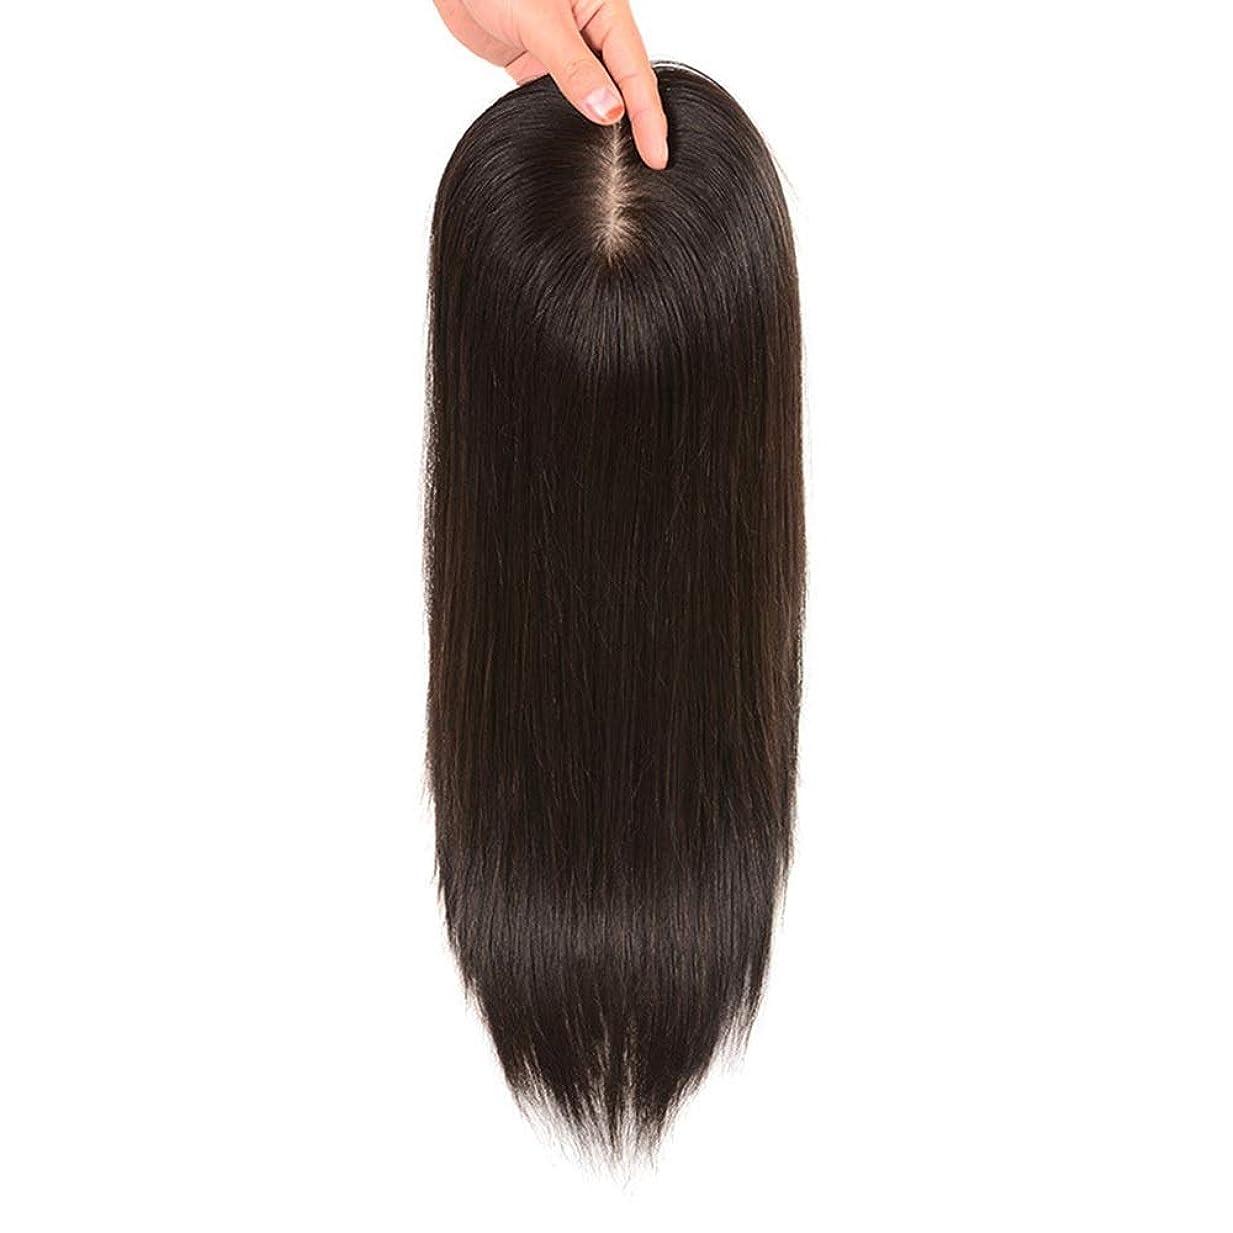 HOHYLLYA 女性の長いストレートヘアクリップヘアエクステンションで髪をかつら見えないパーティーかつらを増やす (色 : Natural black, サイズ : [7x10]25cm)